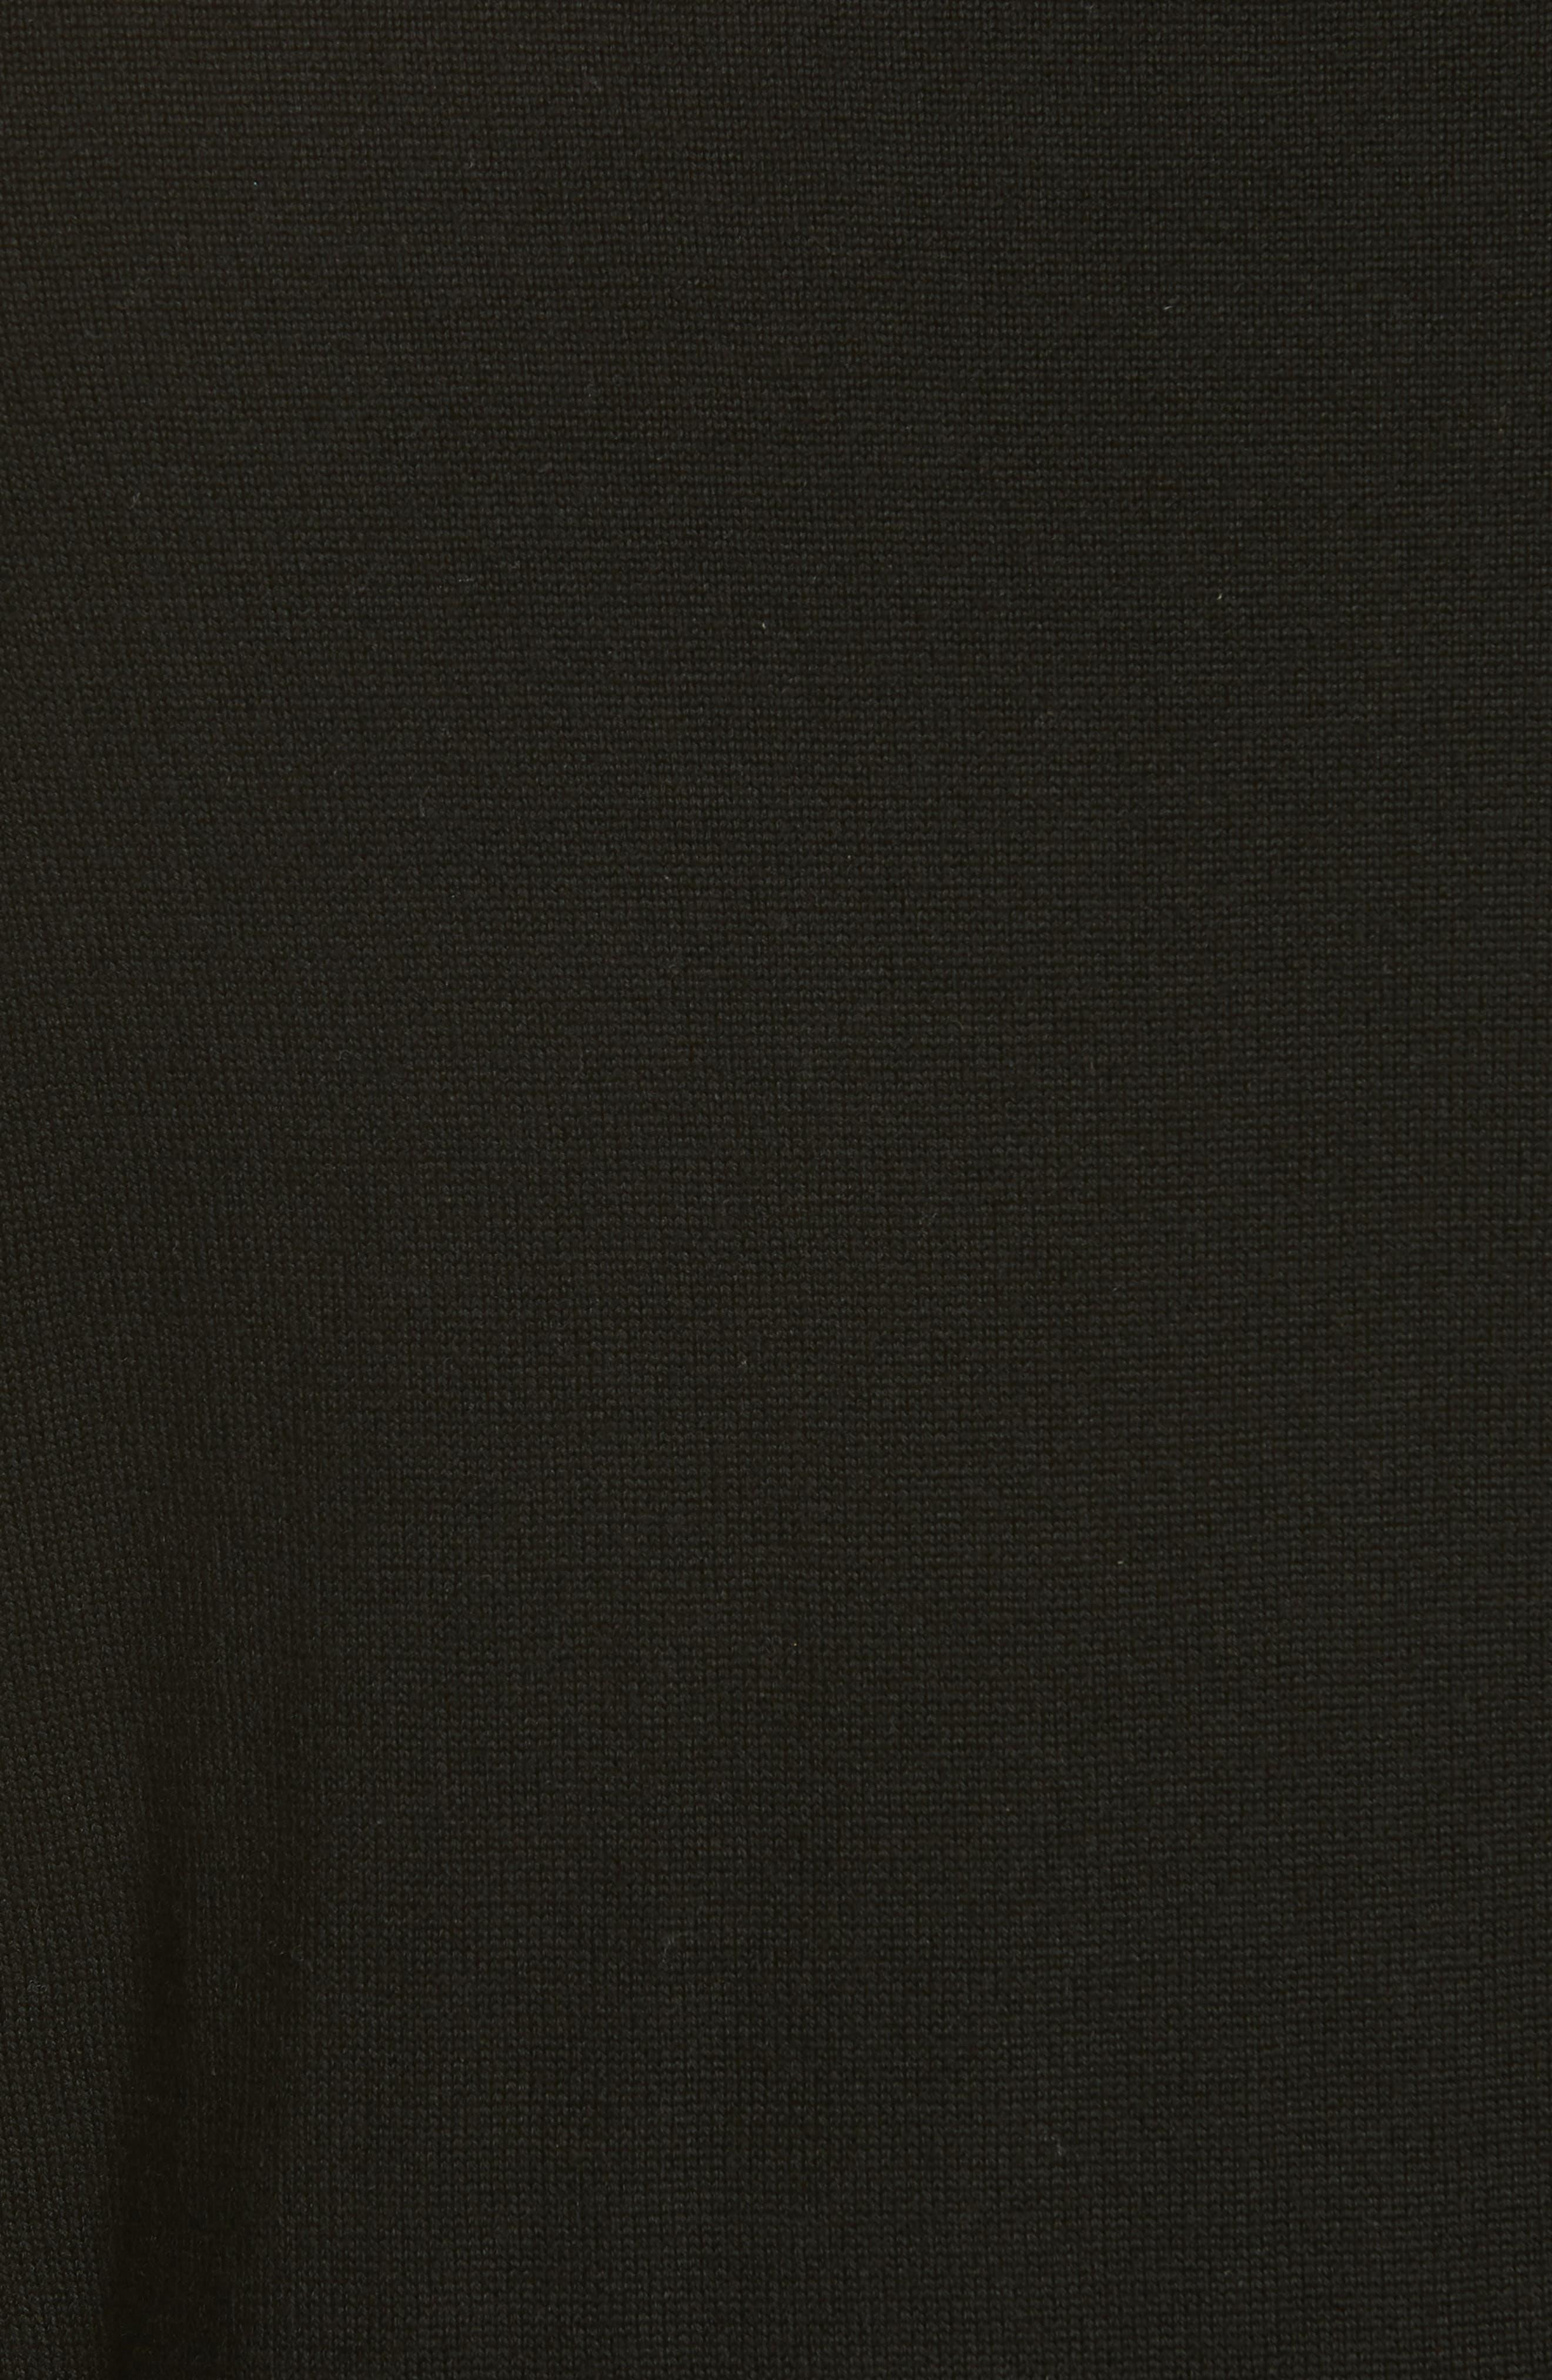 Moon Merino Wool Sweater,                             Alternate thumbnail 5, color,                             001